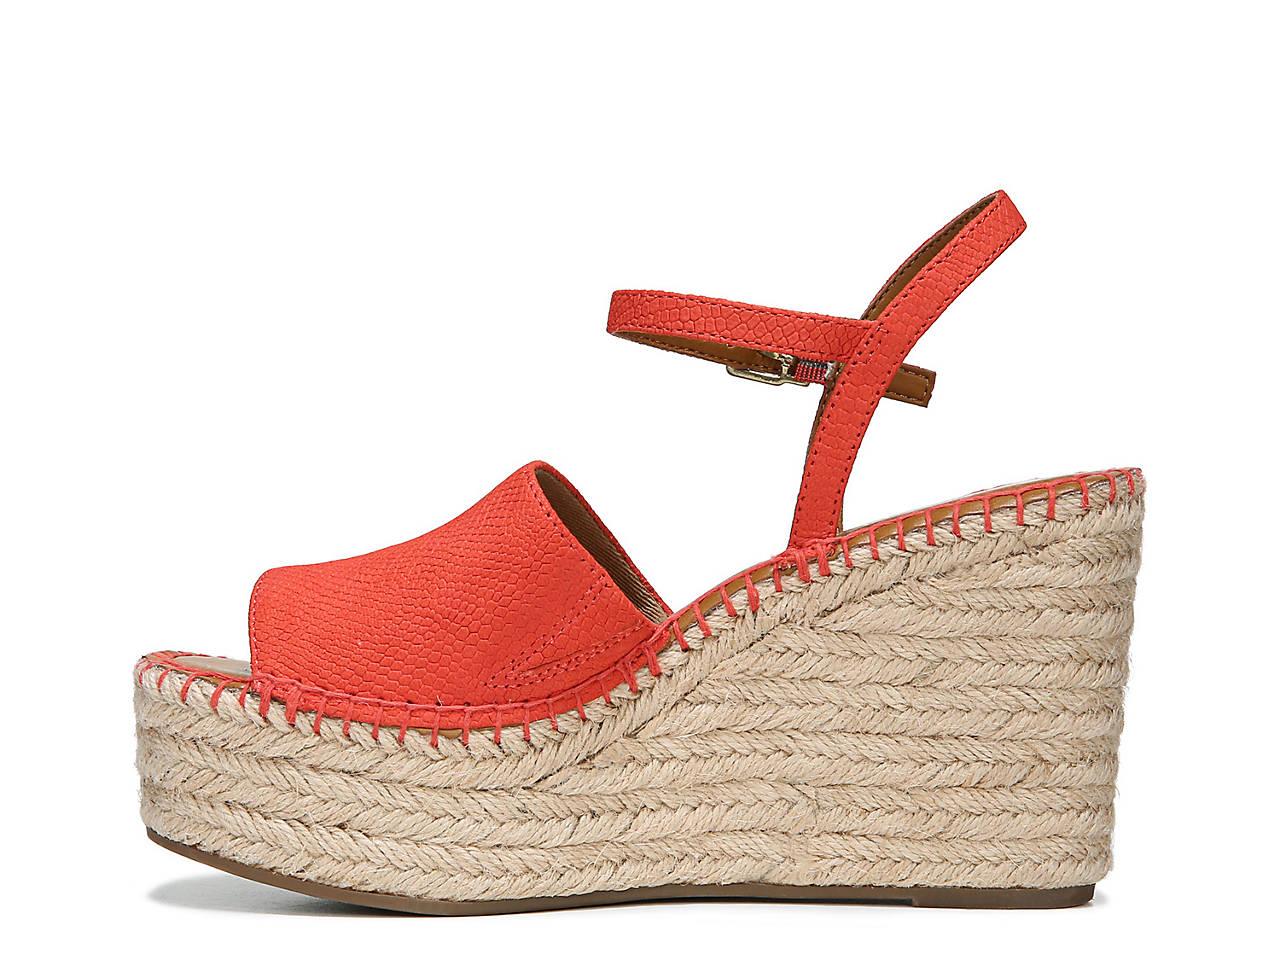 865a7afd2278 Franco Sarto Tula Espadrille Wedge Sandal Women s Shoes